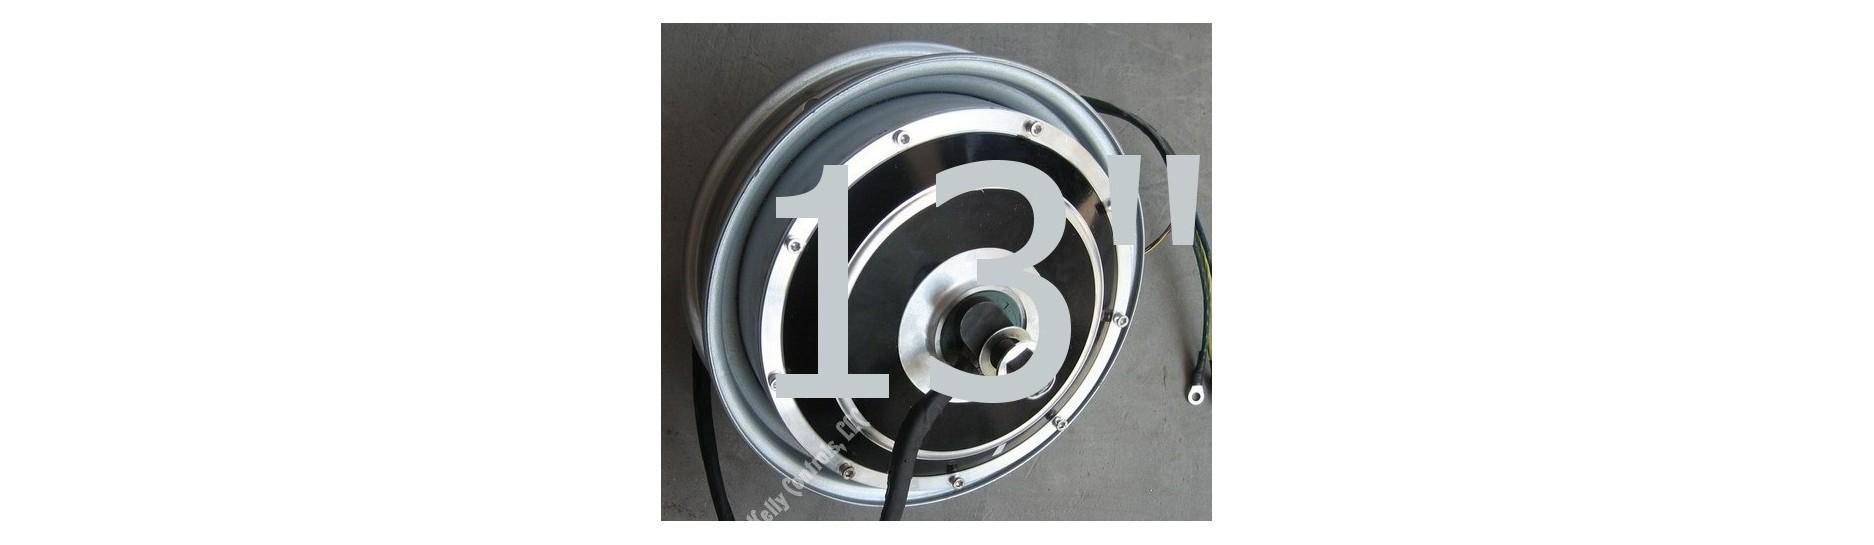 "BLDC hub stejnosměrný motor dc 13"""